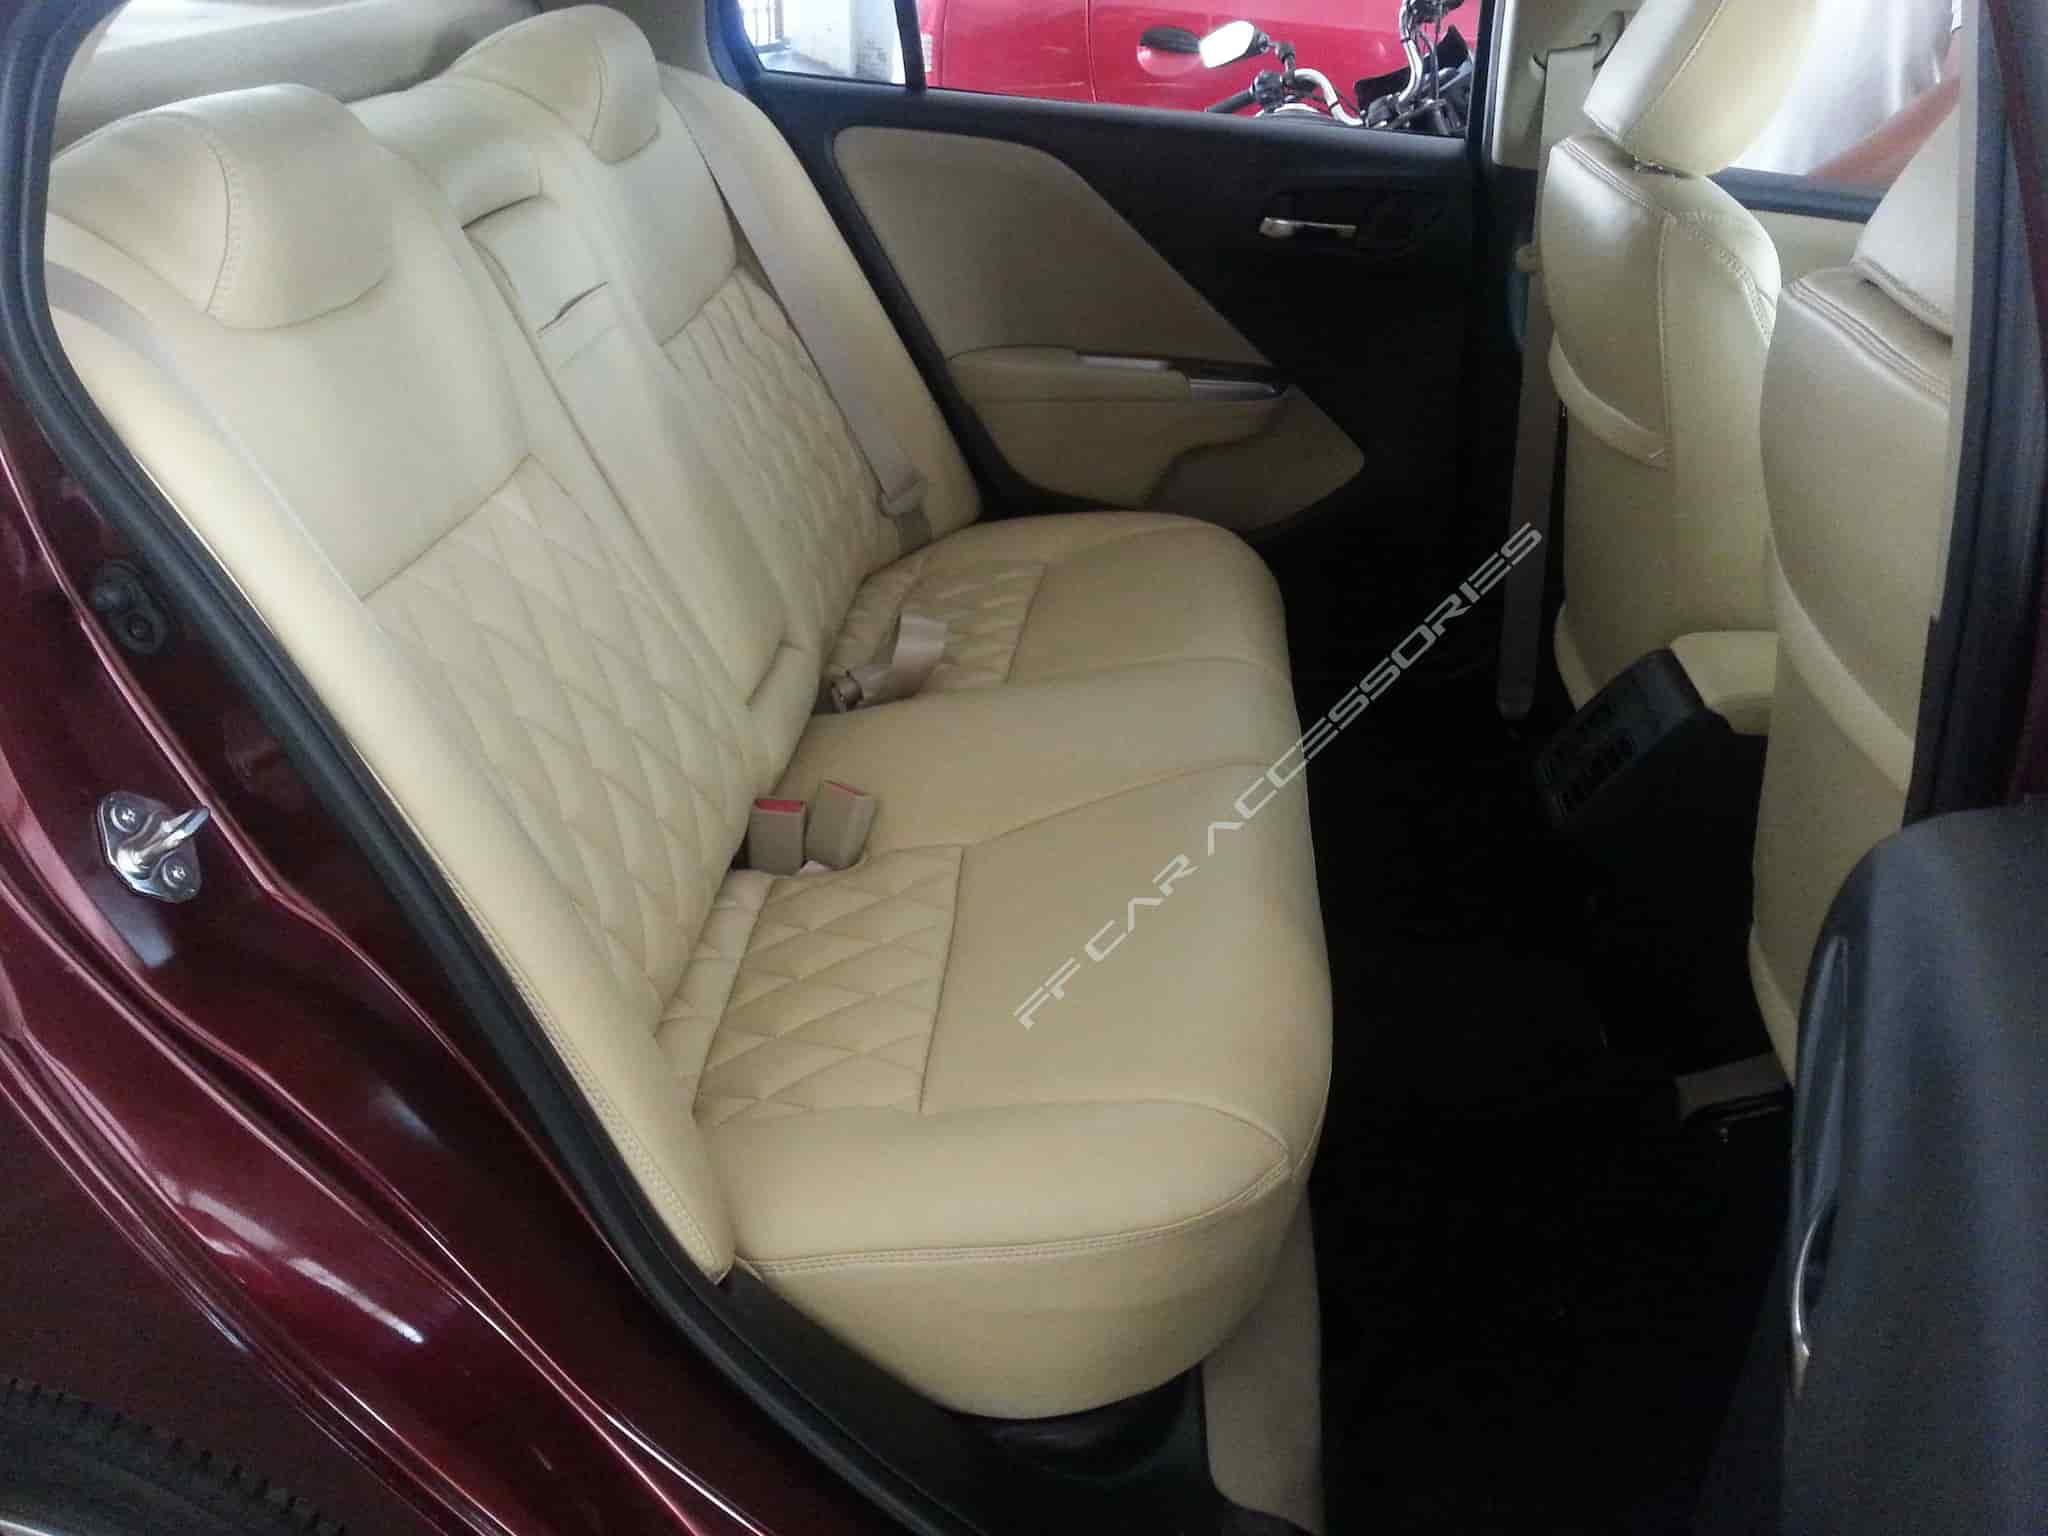 ... Honda City Custom Fit Seat Cover   F F Car Accessories Photos, Mount  Road, Chennai ...